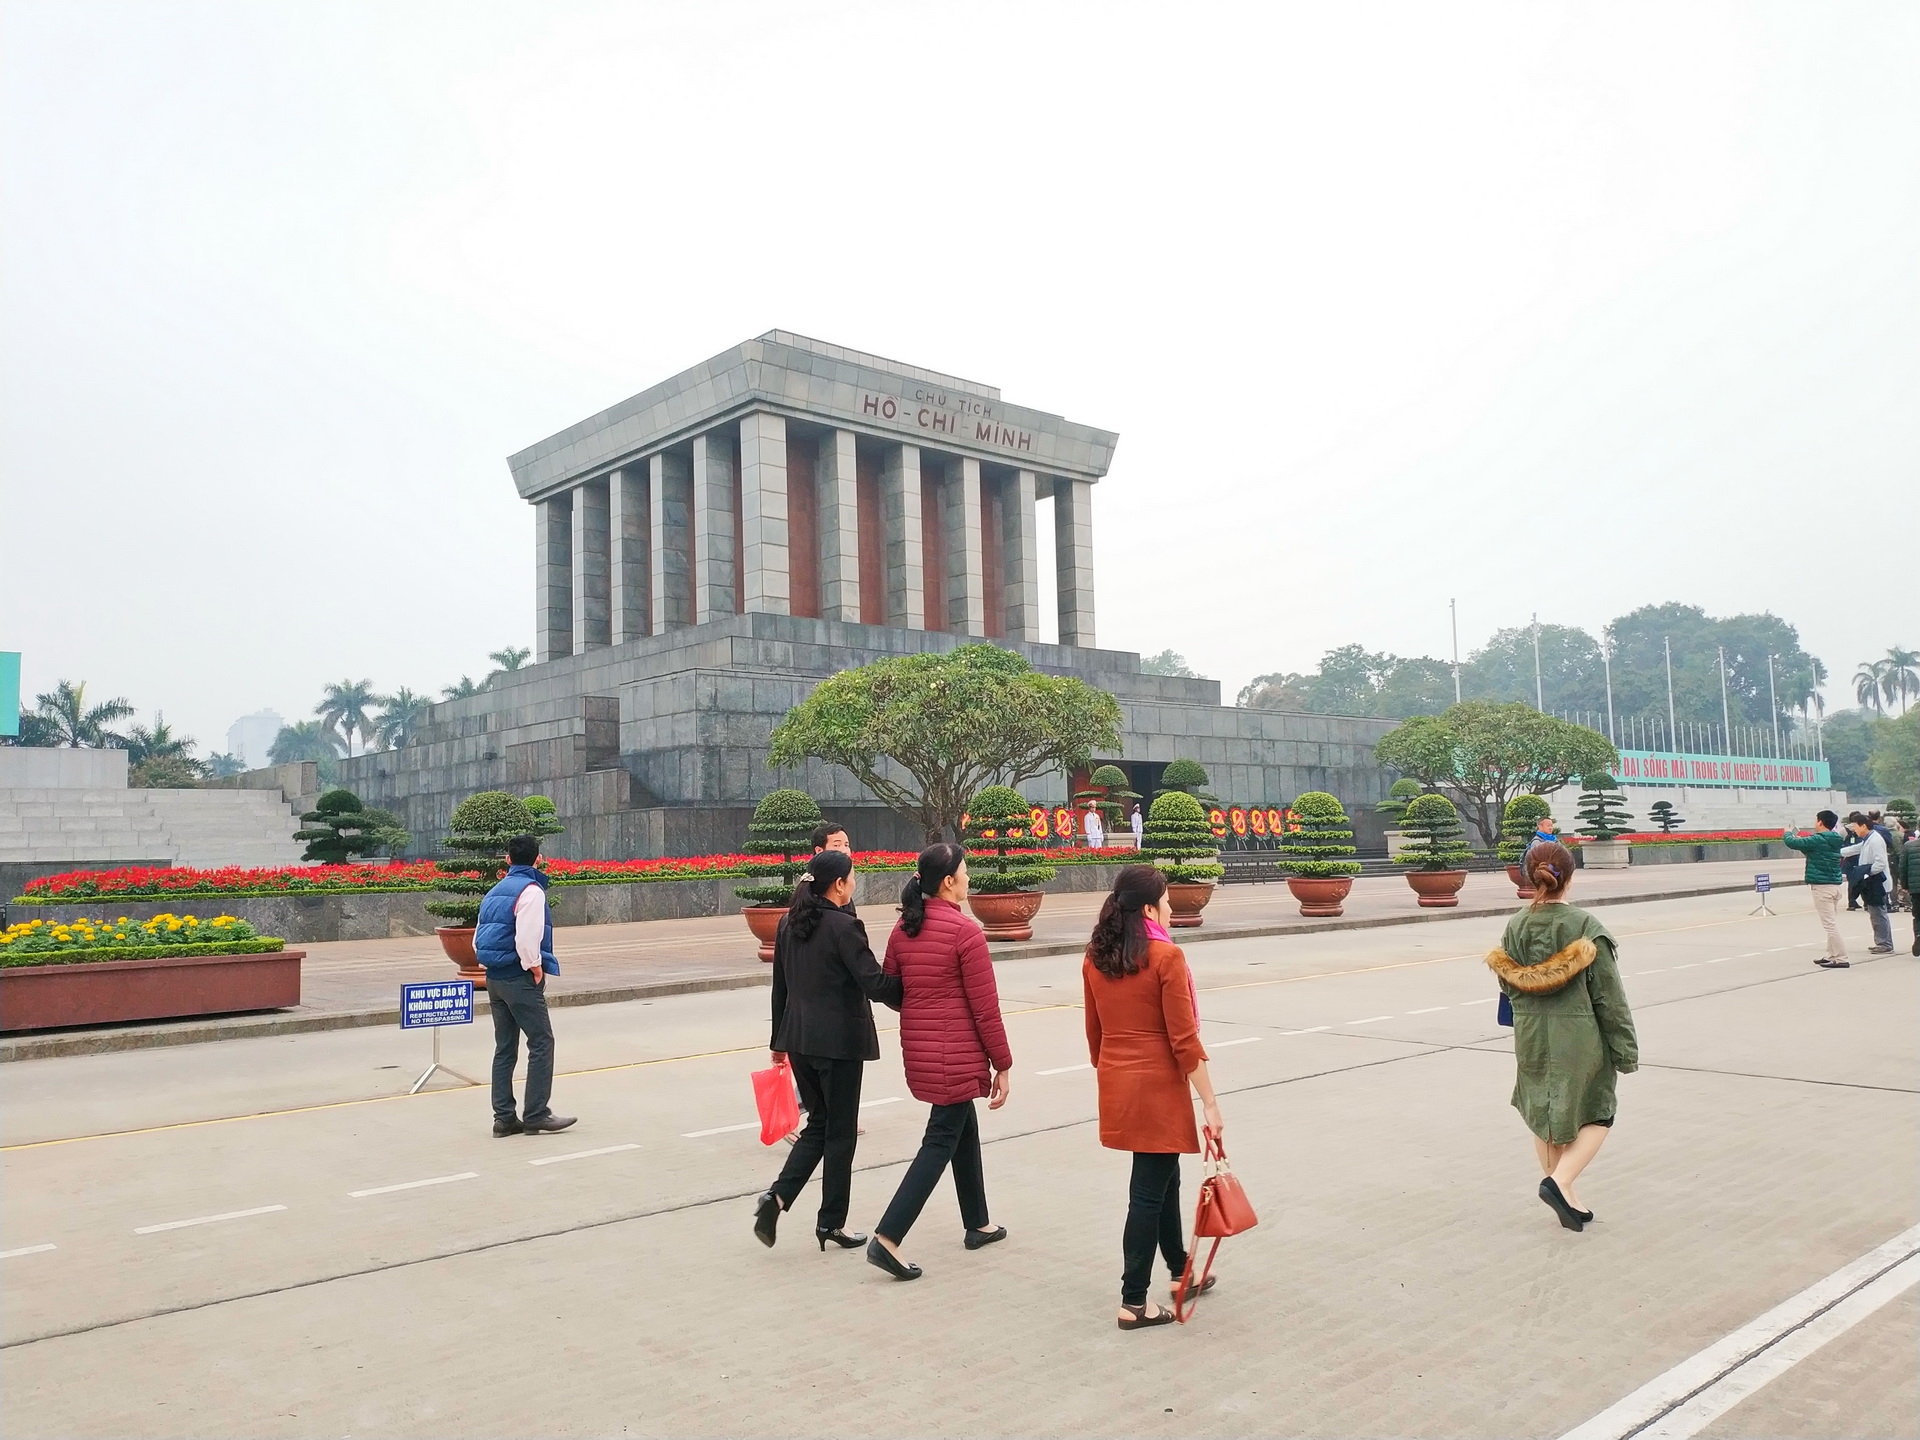 The Ho Chi Minh City Mausoleum in Hanoi. Photo: Tuan Son / Tuoi Tre News